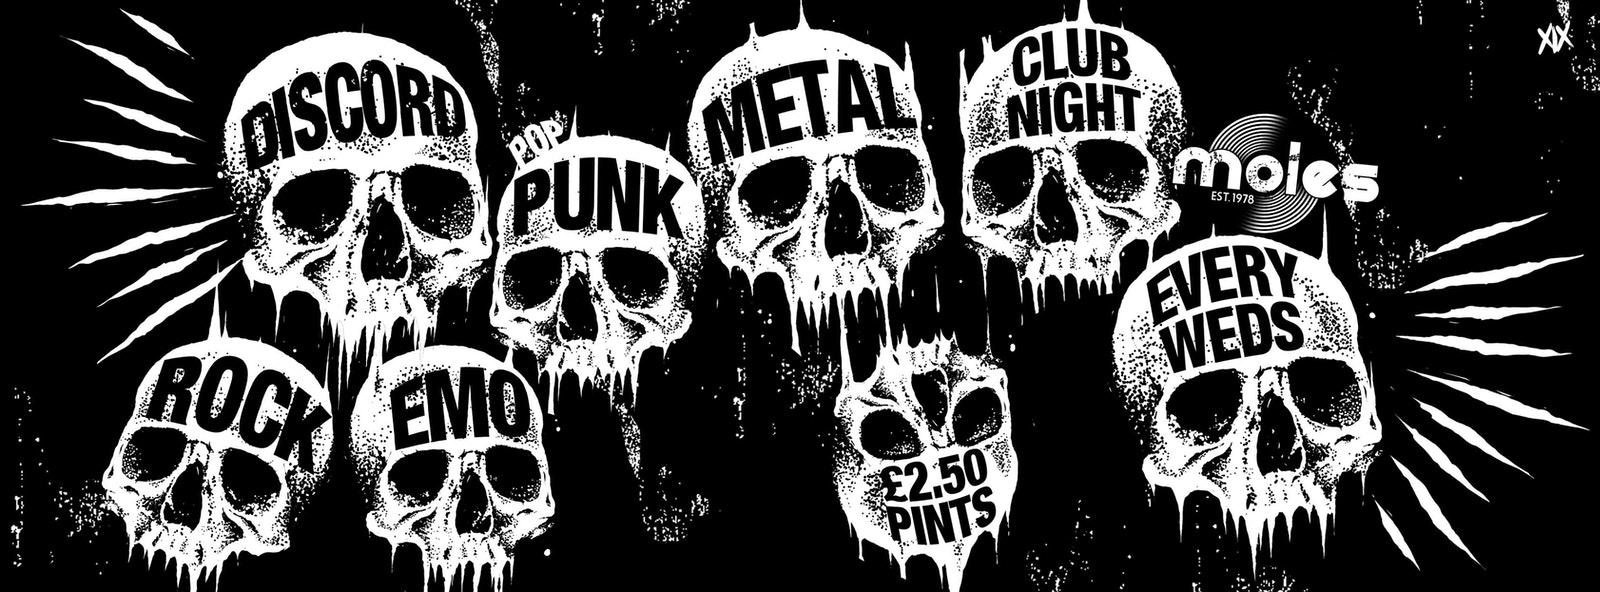 DISCORD – Rock, Emo, Pop Punk & Metal Club Night!